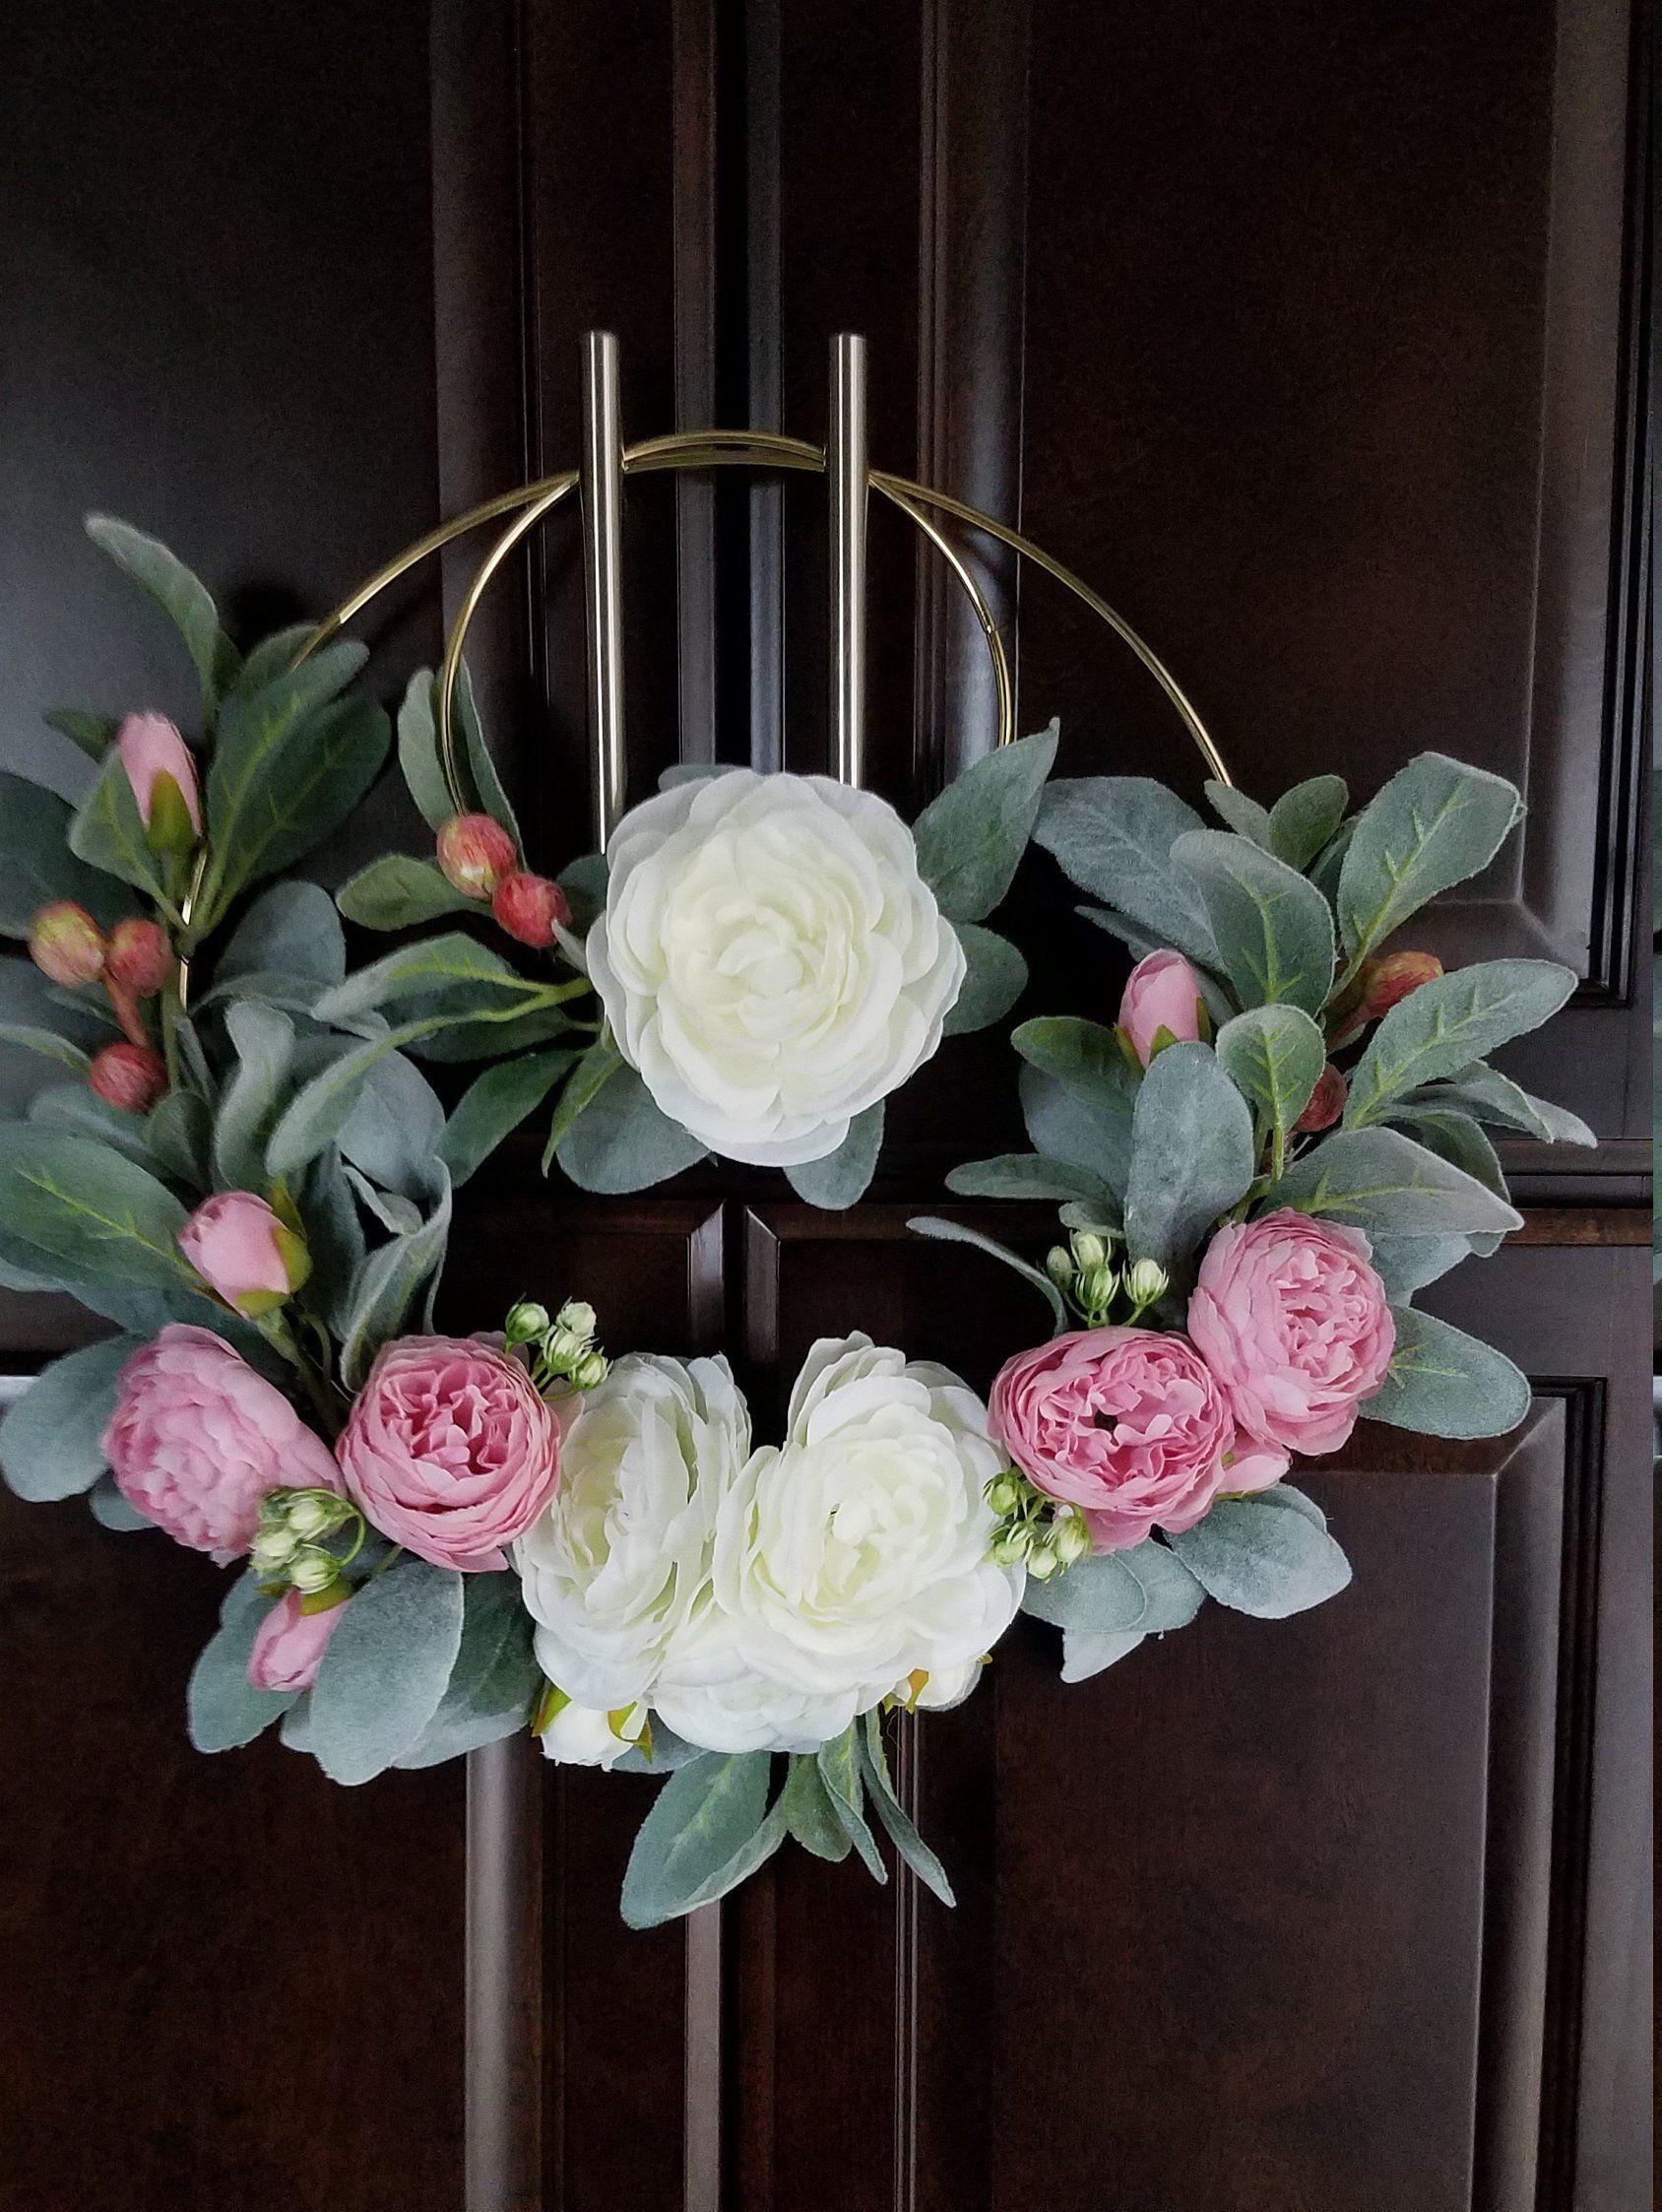 Modern Door Wreath Set Of Two Hoop Wreaths Nursery Wreath Set Lambs Ear And Peony Wreaths Lavender Decor Door Wreaths Floral Wreath